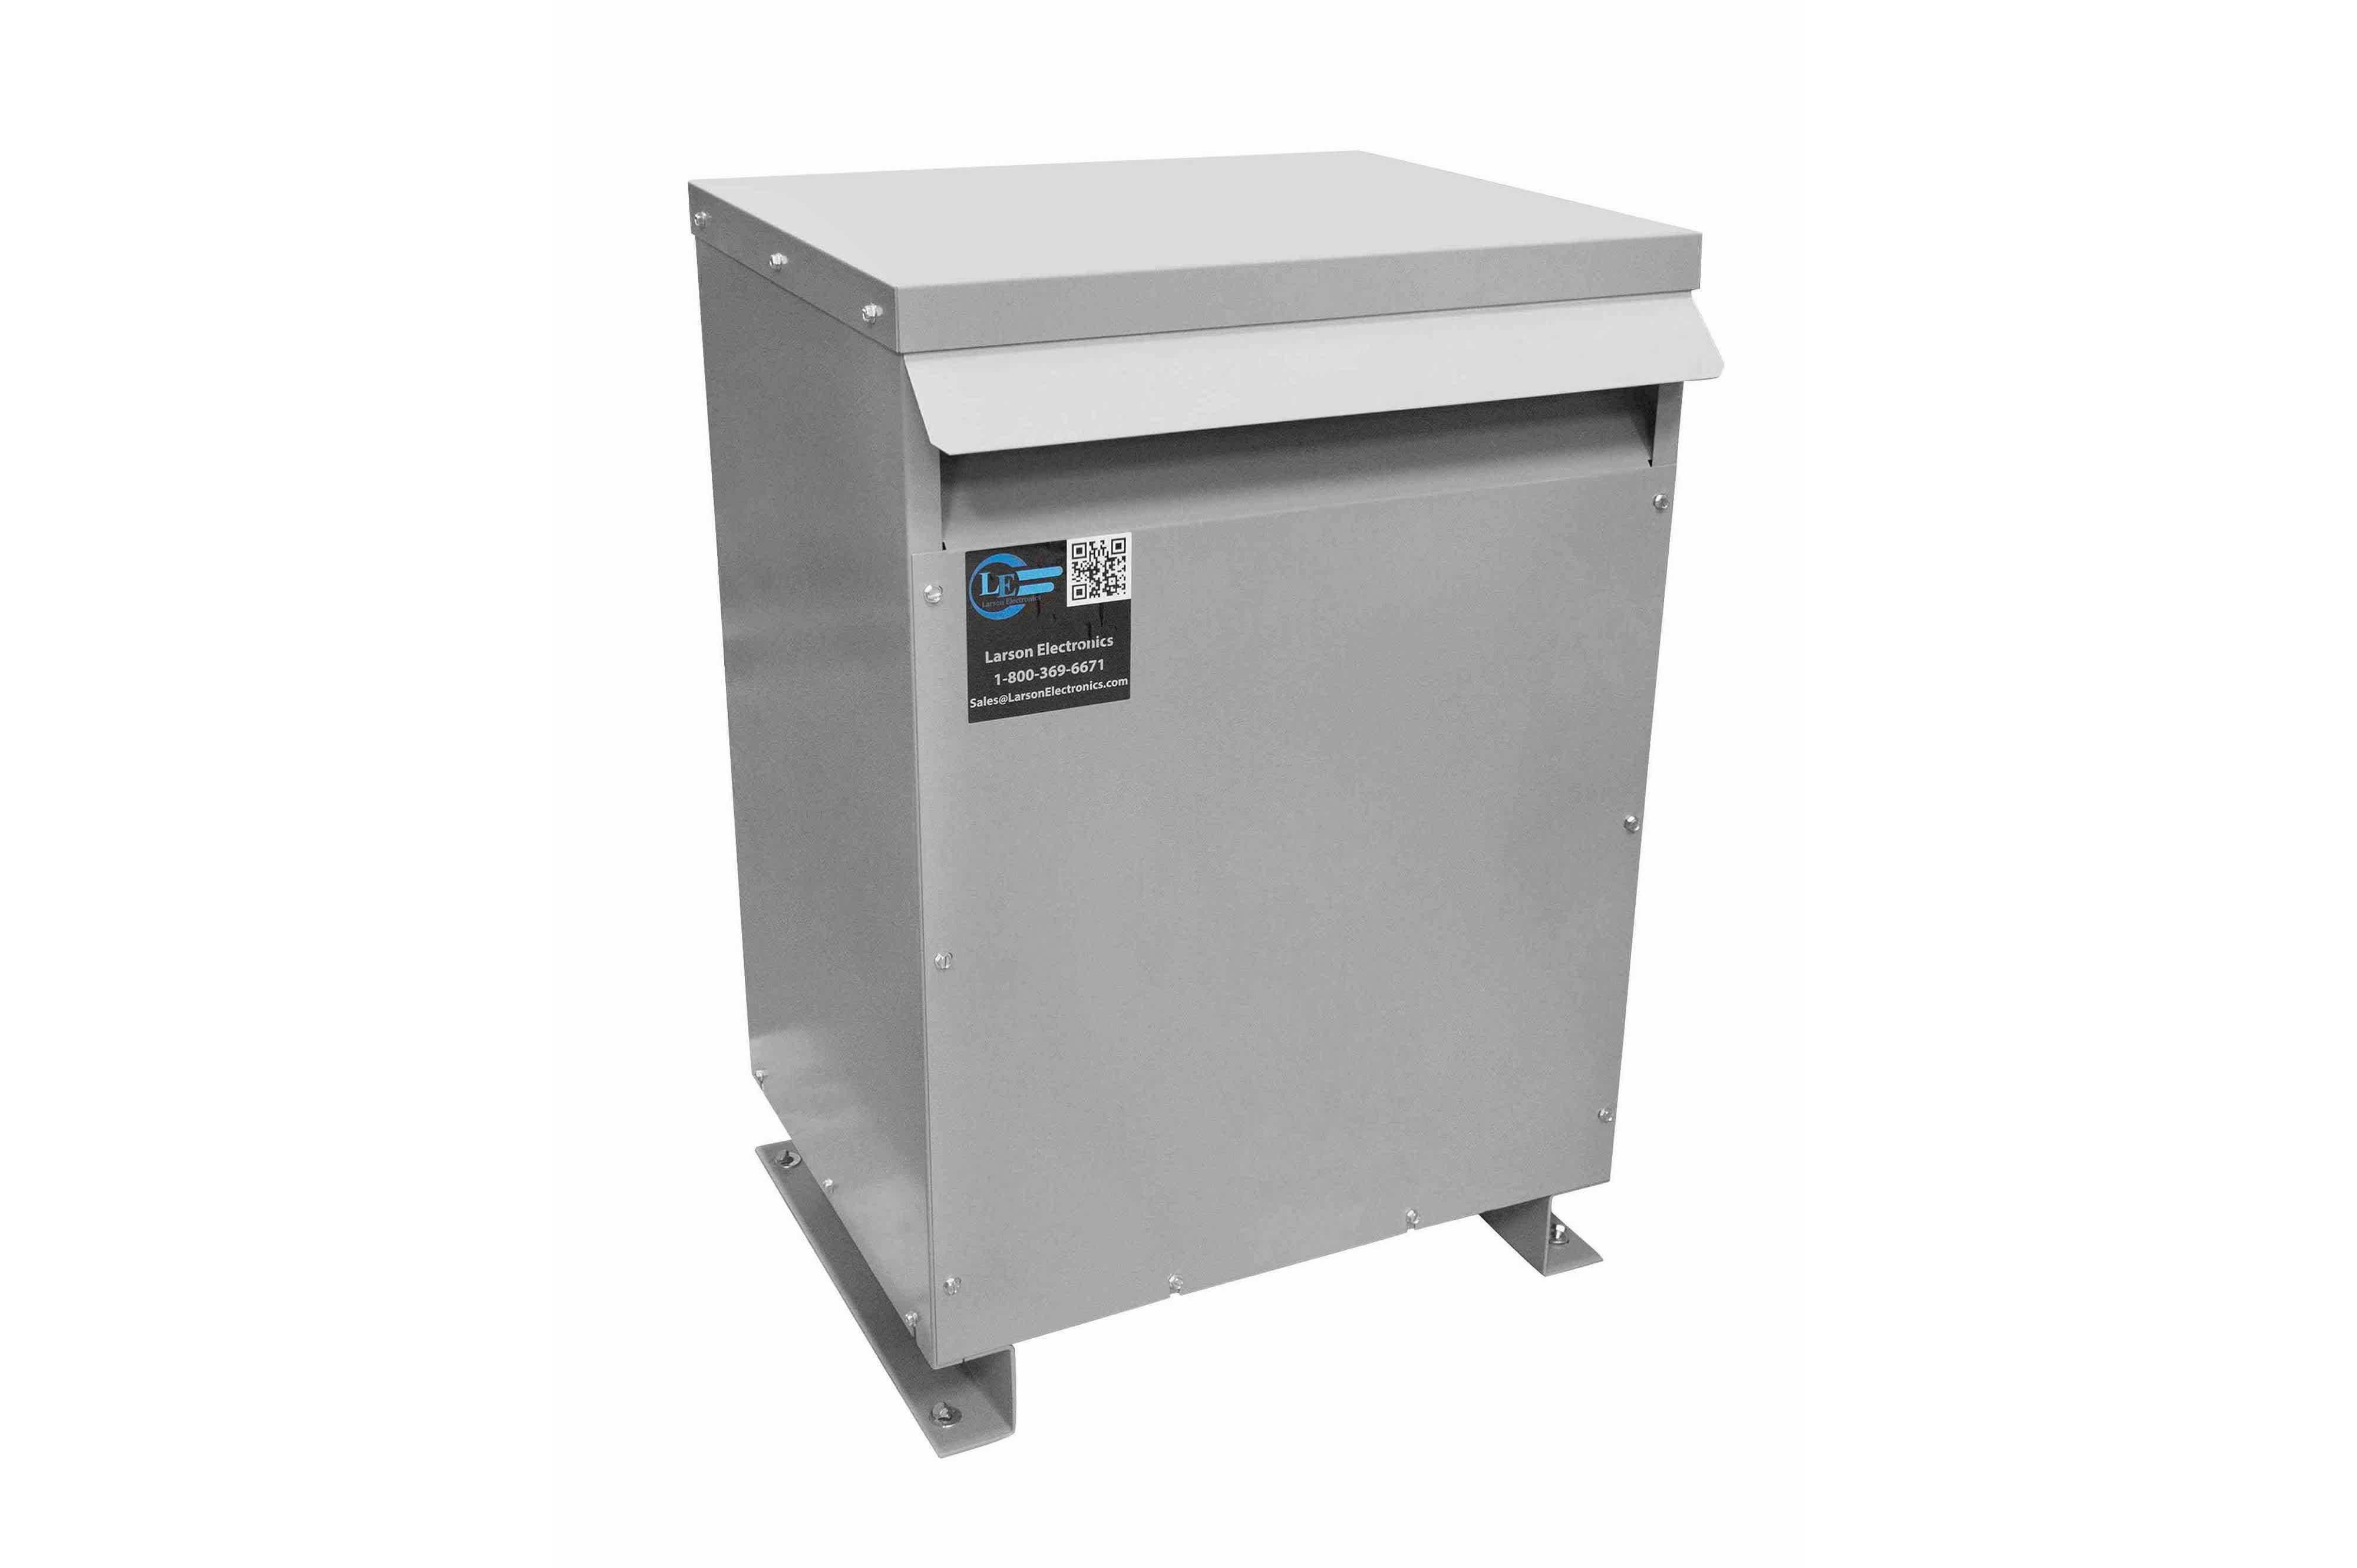 150 kVA 3PH Isolation Transformer, 400V Wye Primary, 240V/120 Delta Secondary, N3R, Ventilated, 60 Hz